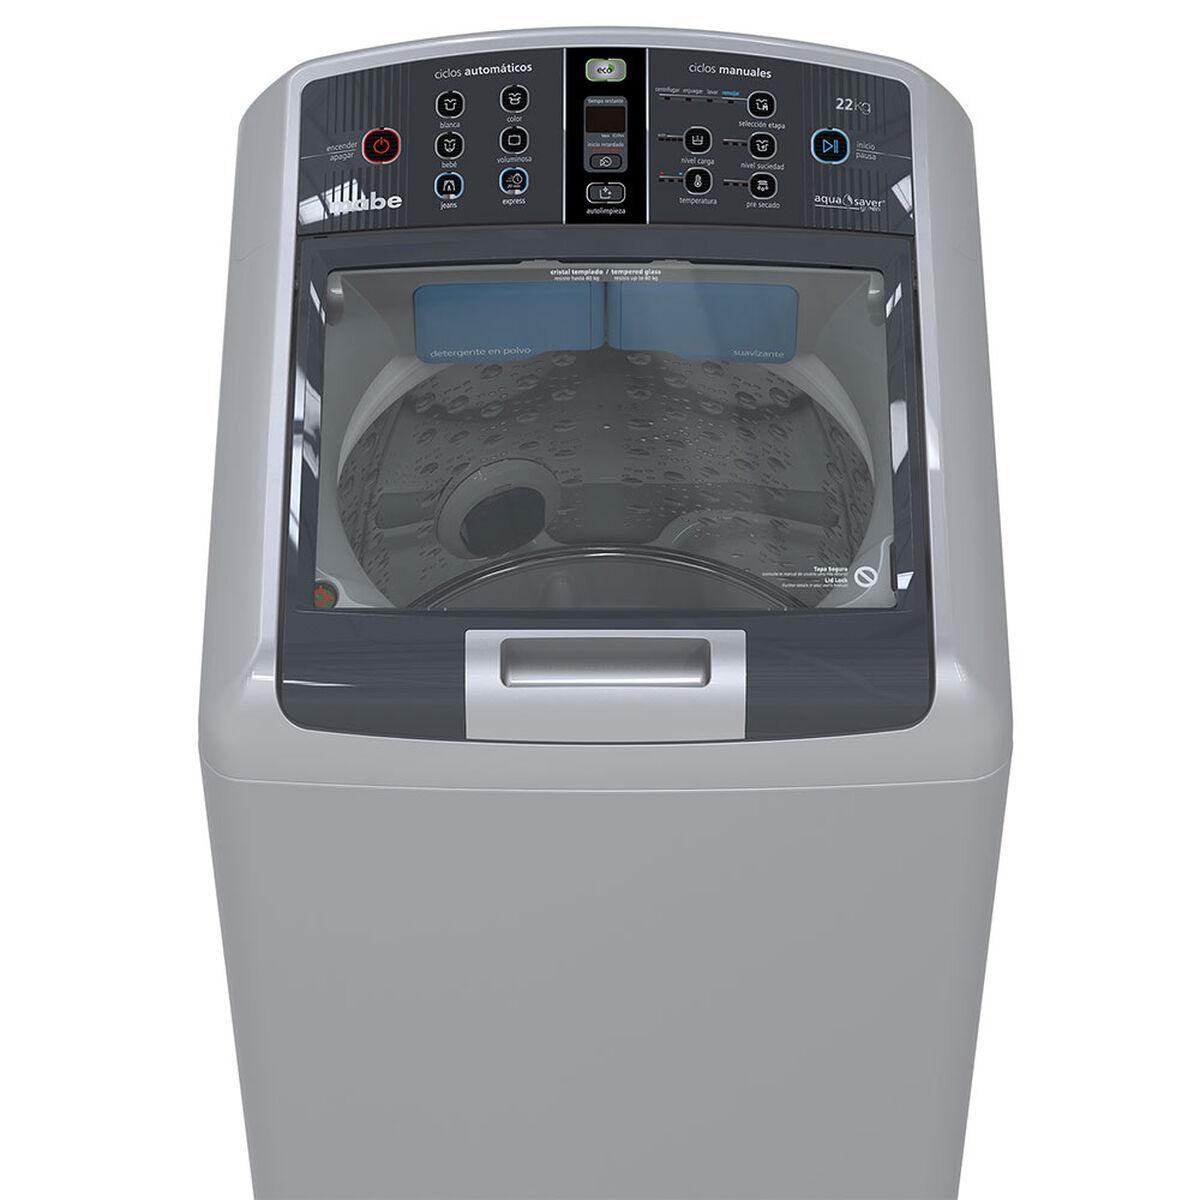 Lavadora Automática Mabe LMA72200WGCL0 22 kg